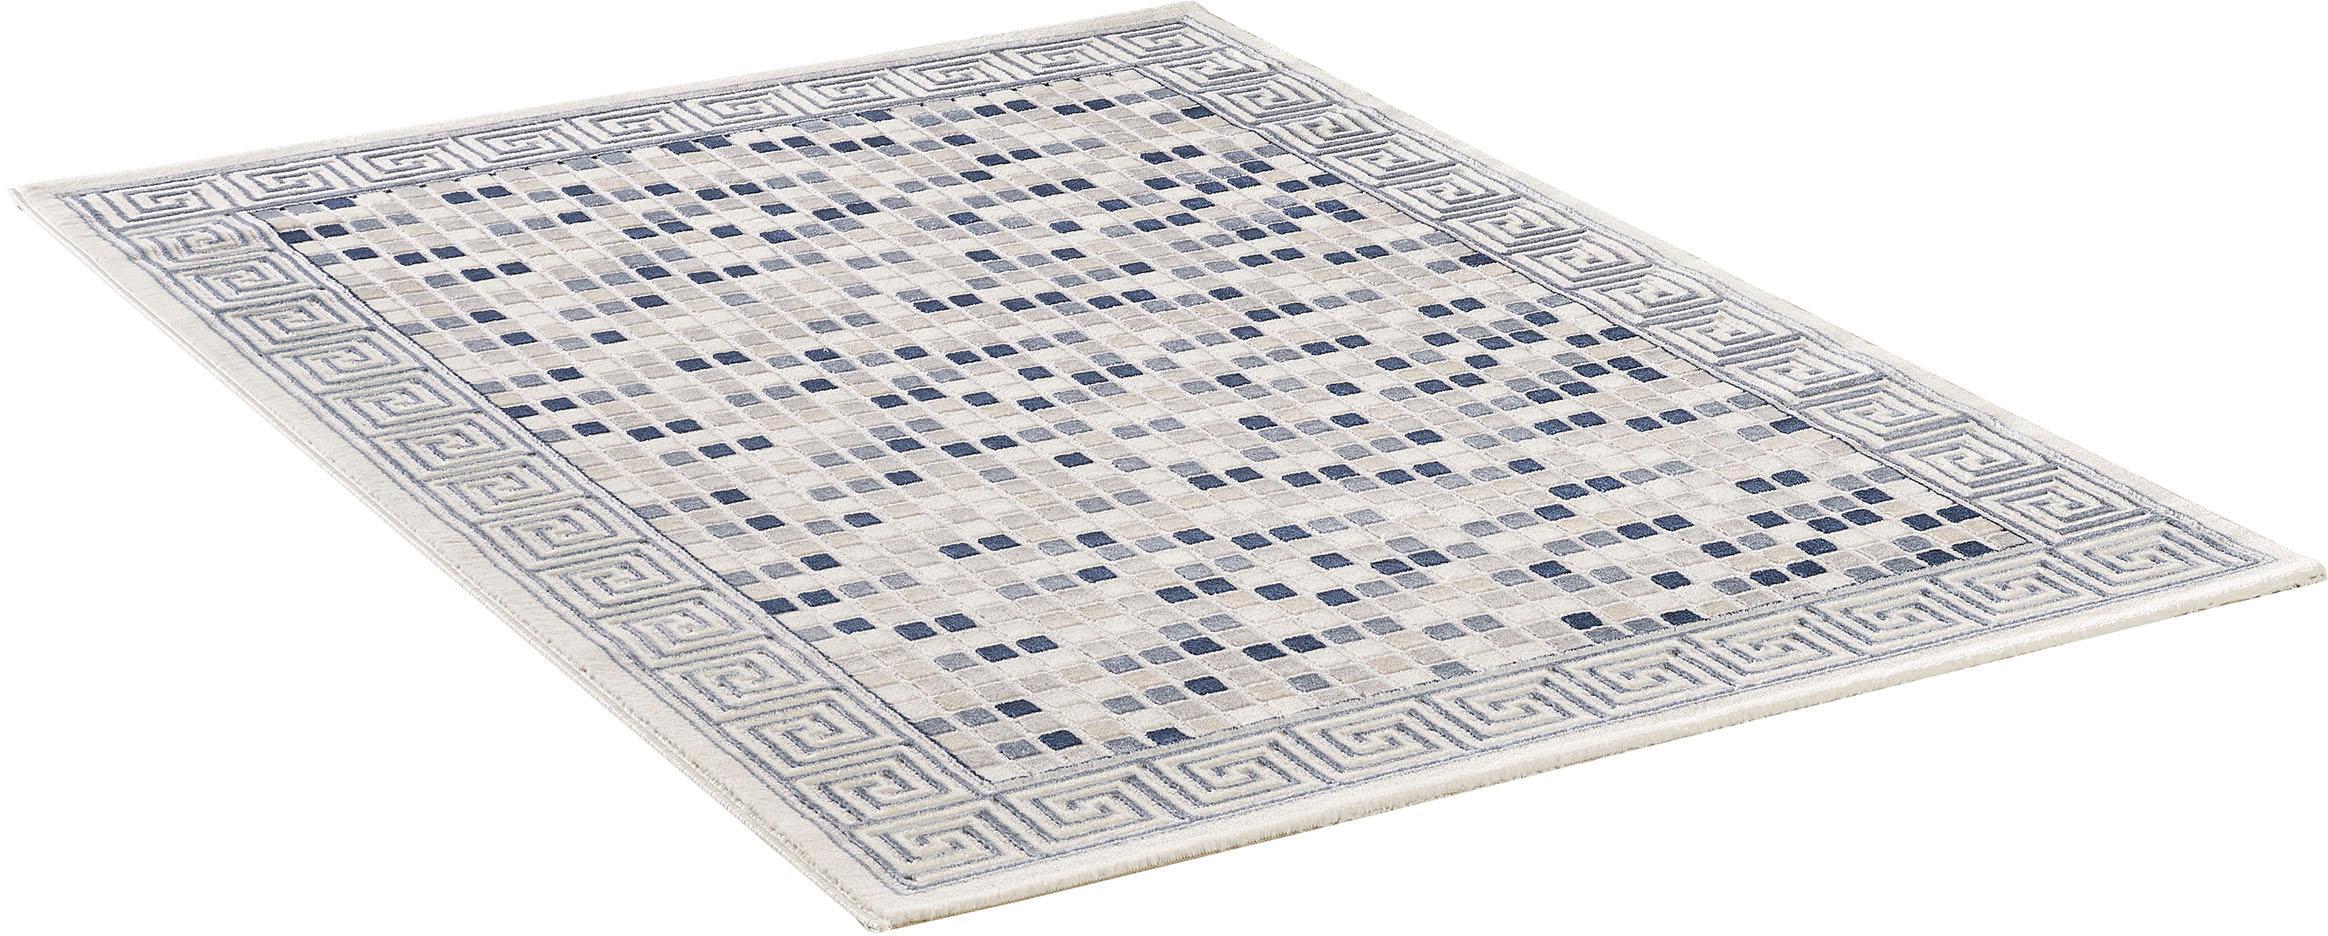 Teppich Harmony 3207 Sanat Teppiche rechteckig Höhe 12 mm maschinell gewebt